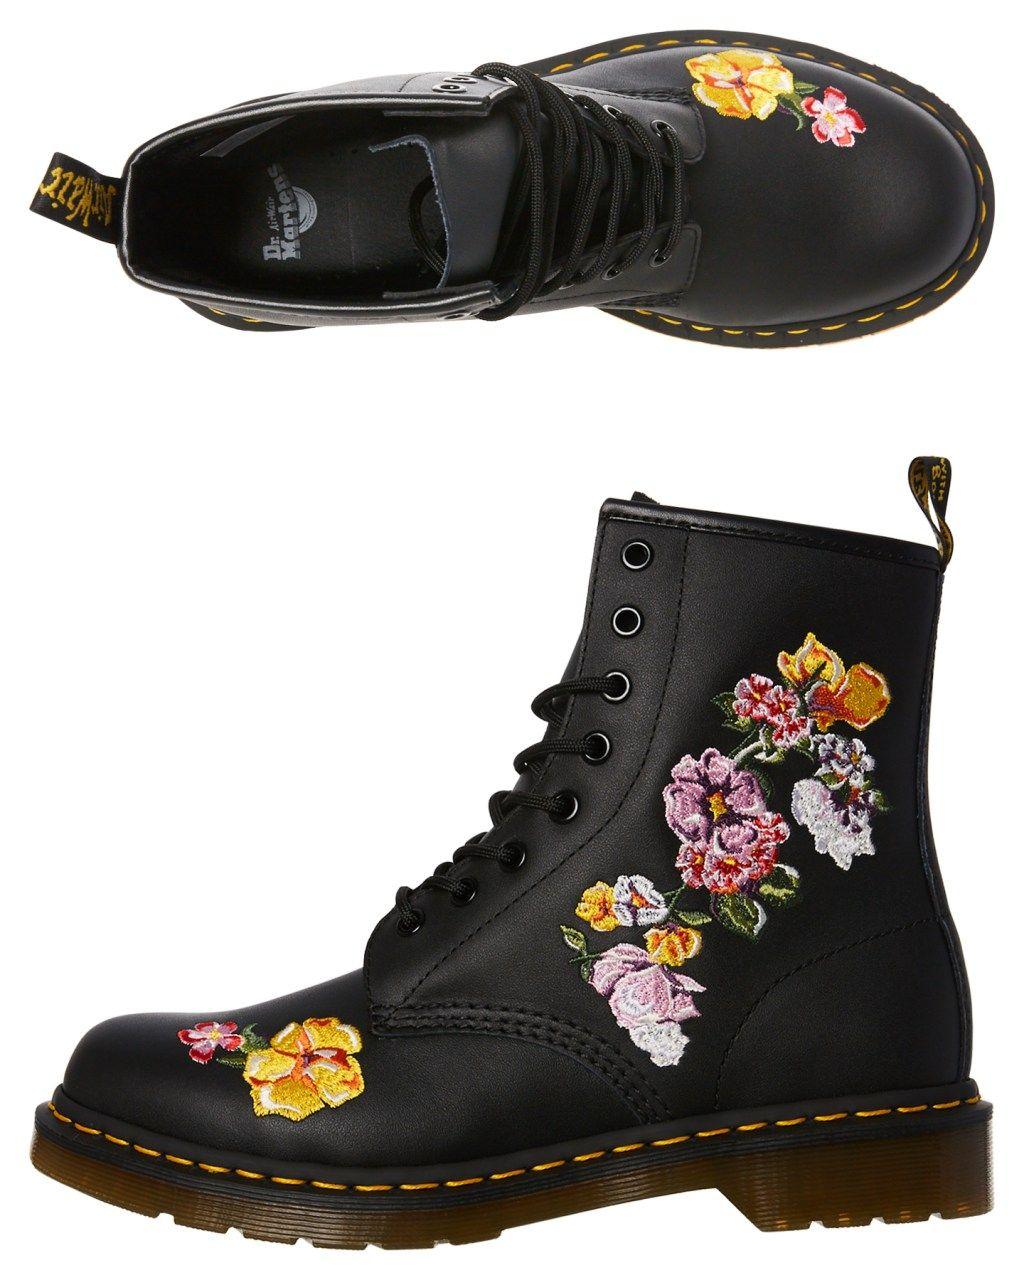 e397ffd55e3b Dr. Martens Womens 1460 Vonda 8 Eye Boot Black Womens Boots Size 5 ...